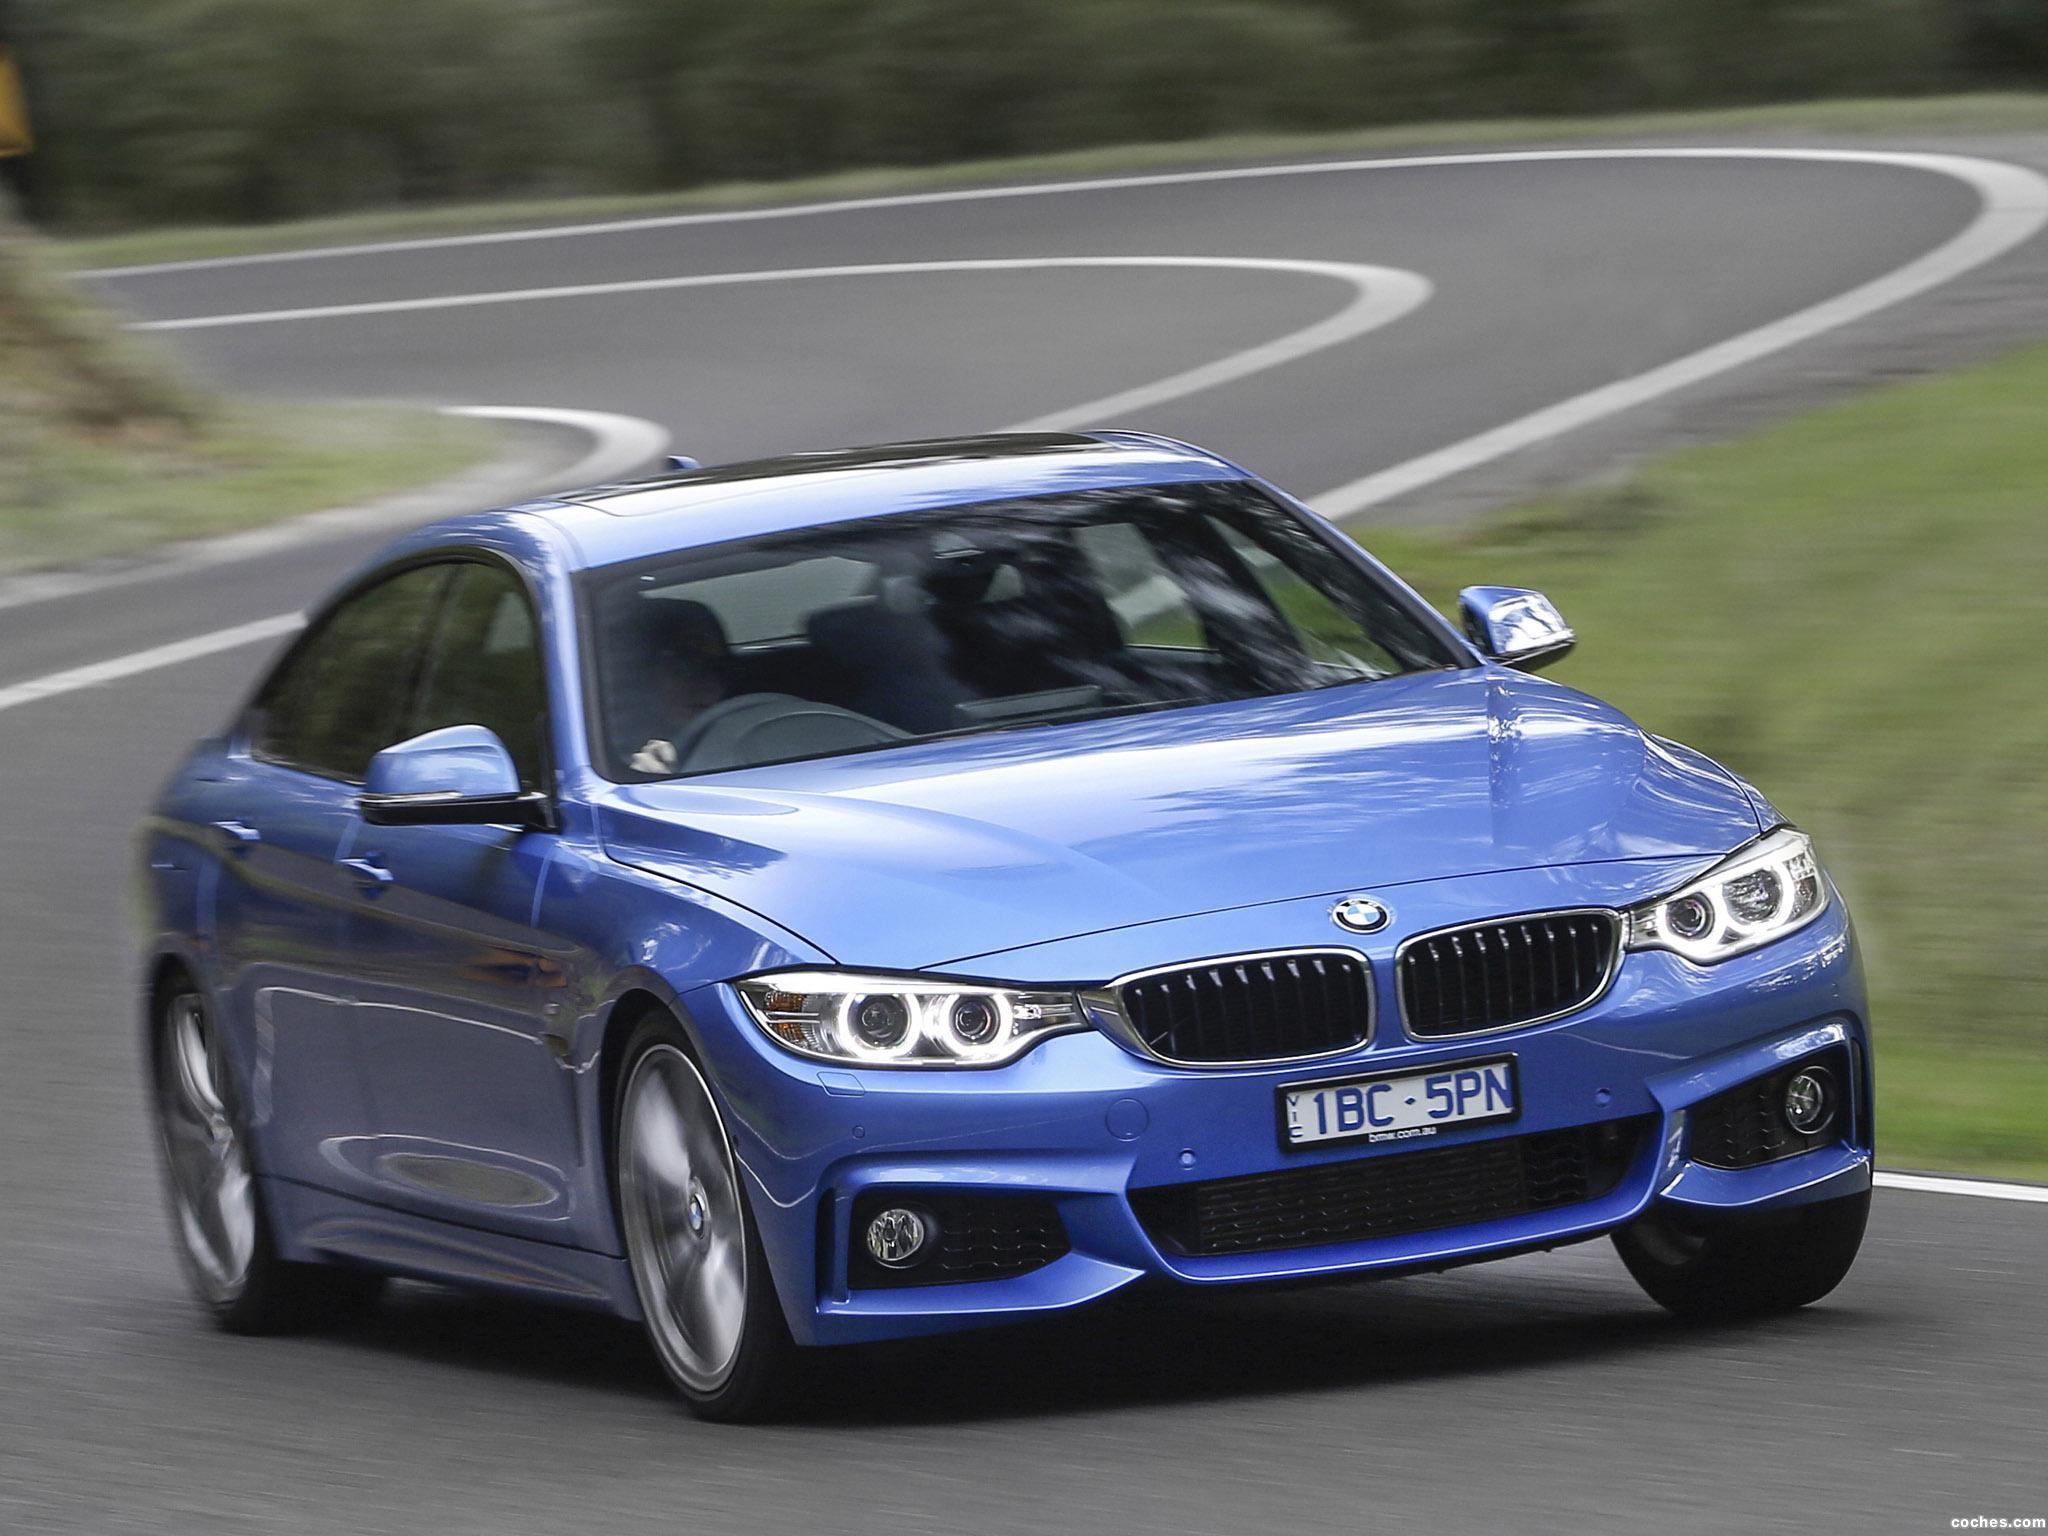 bmw_4-series-435i-gran-coupe-m-sport-package-f36-australia-2014_r5.jpg